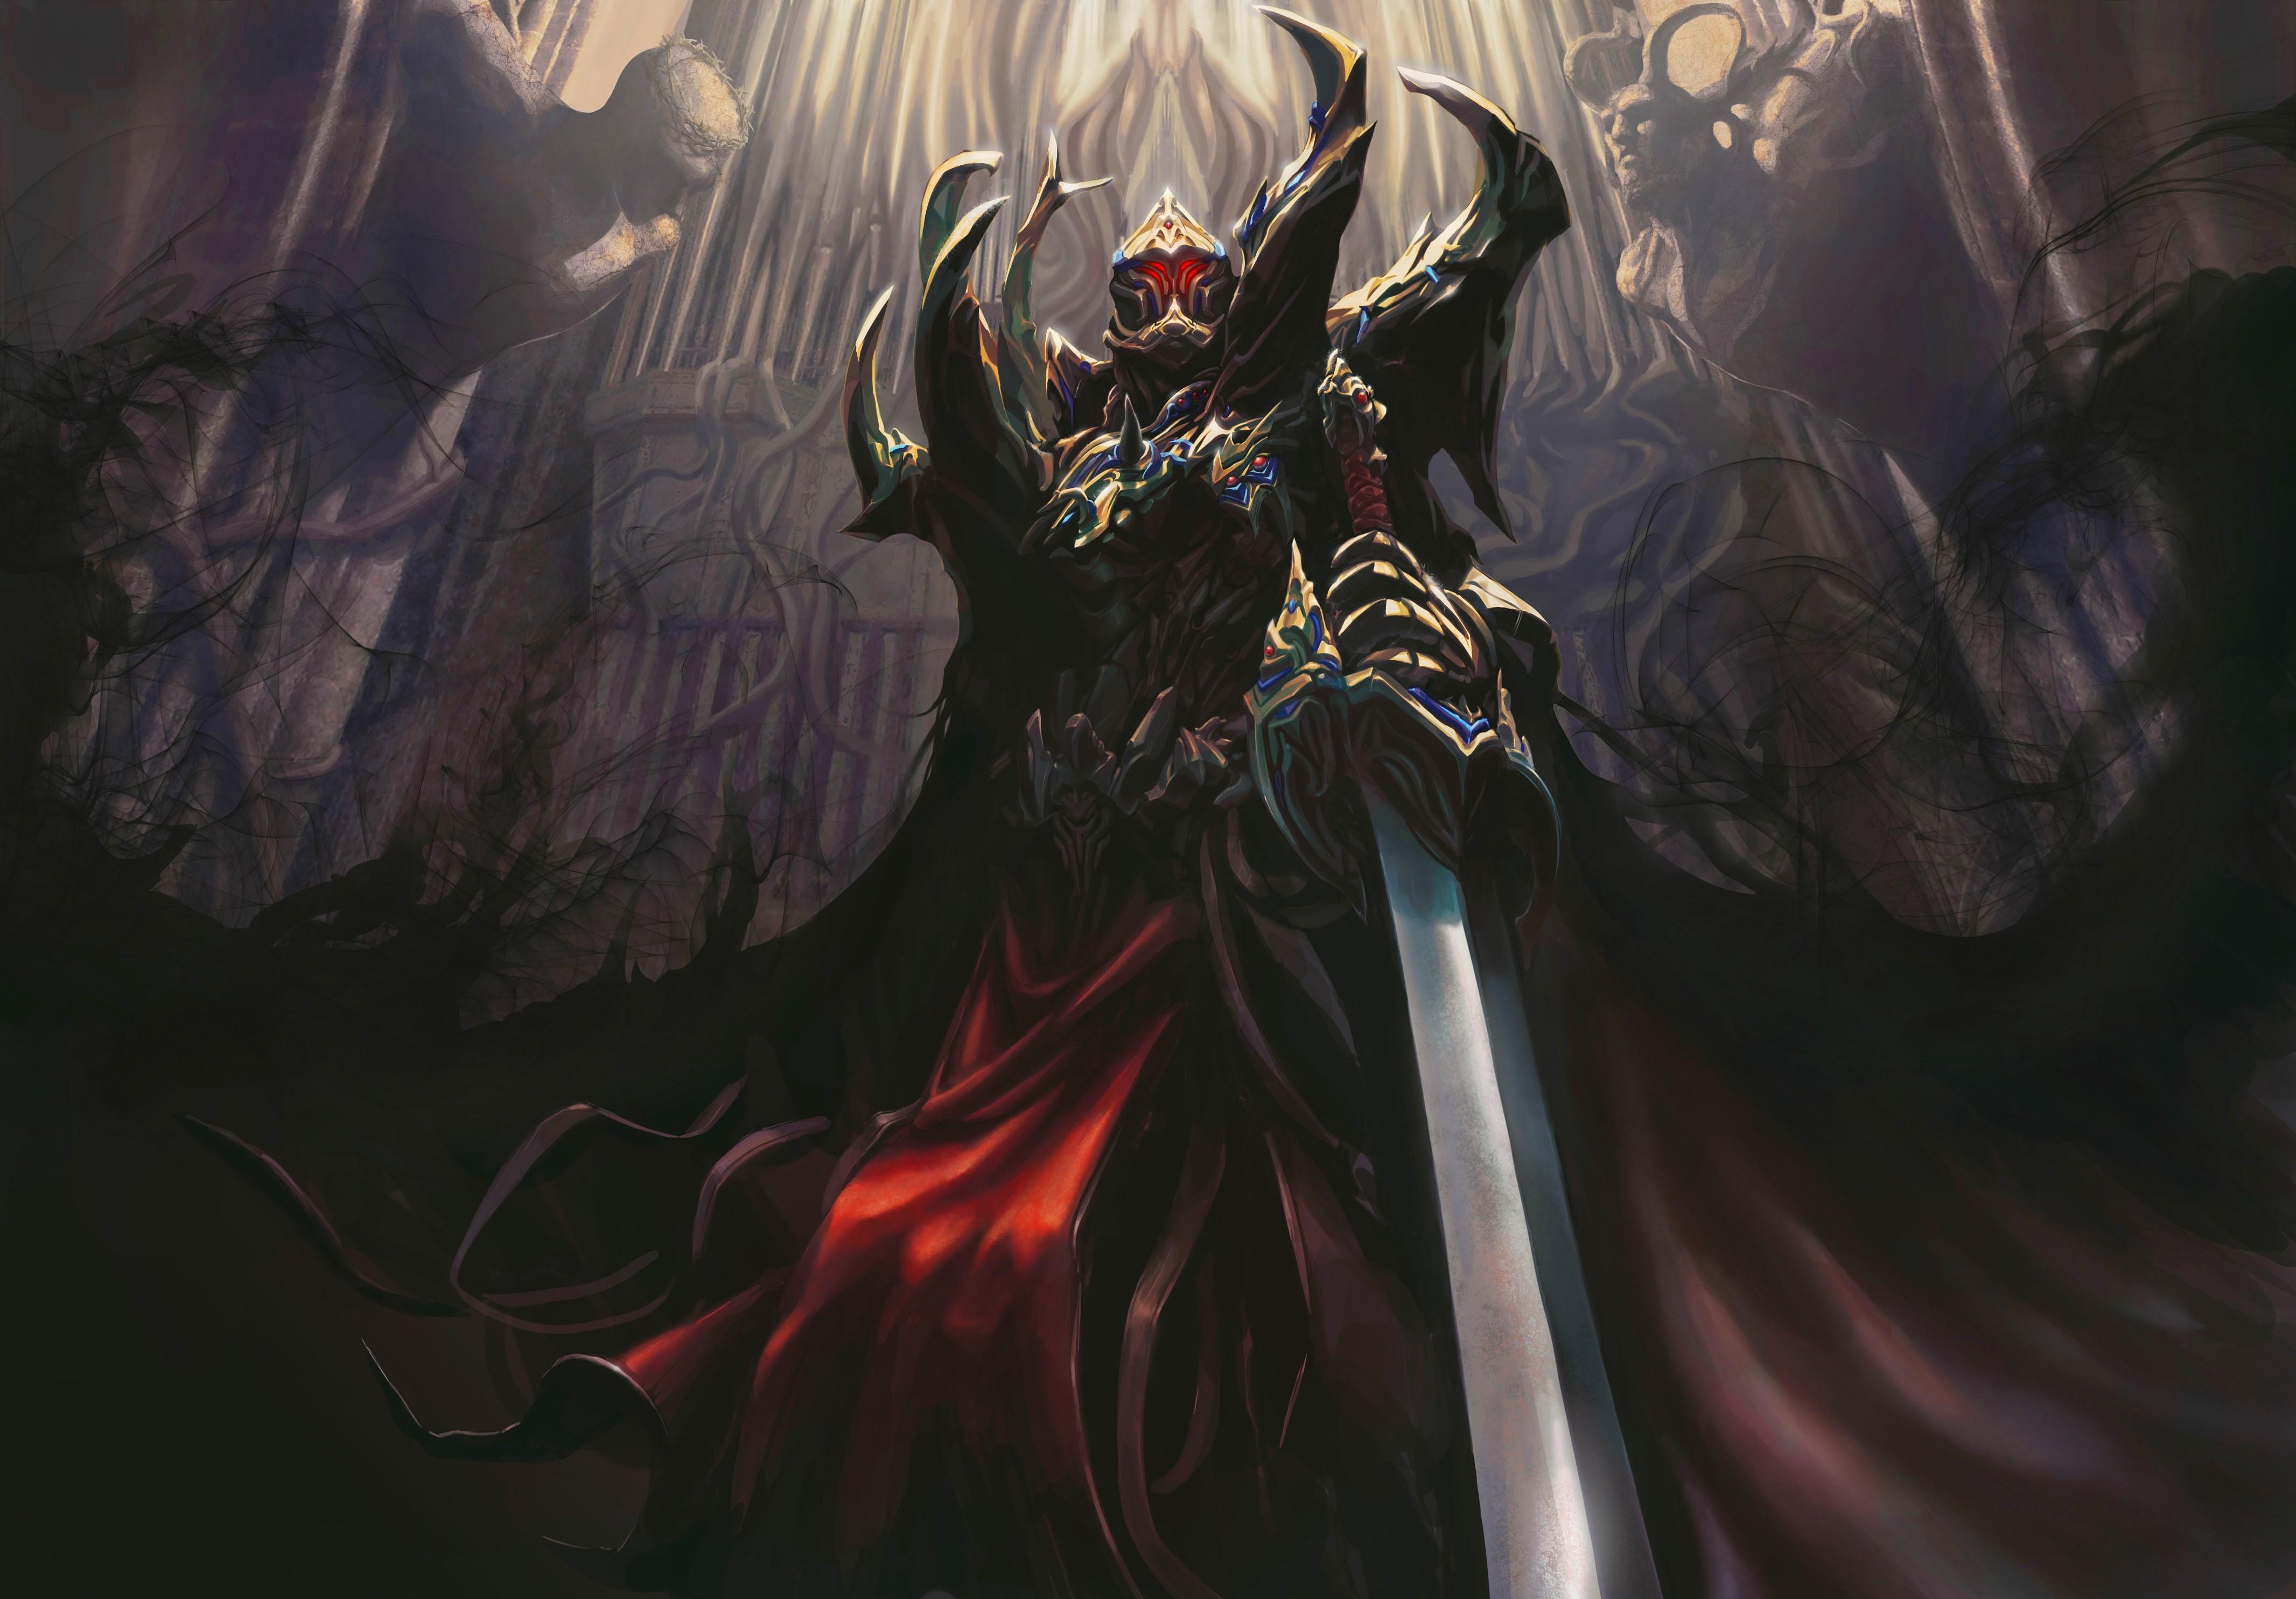 Downaload Overlord King And Warriors Art Wallpaper: Art A Warrior A Demon Sword Armor Dark Castle Dark H